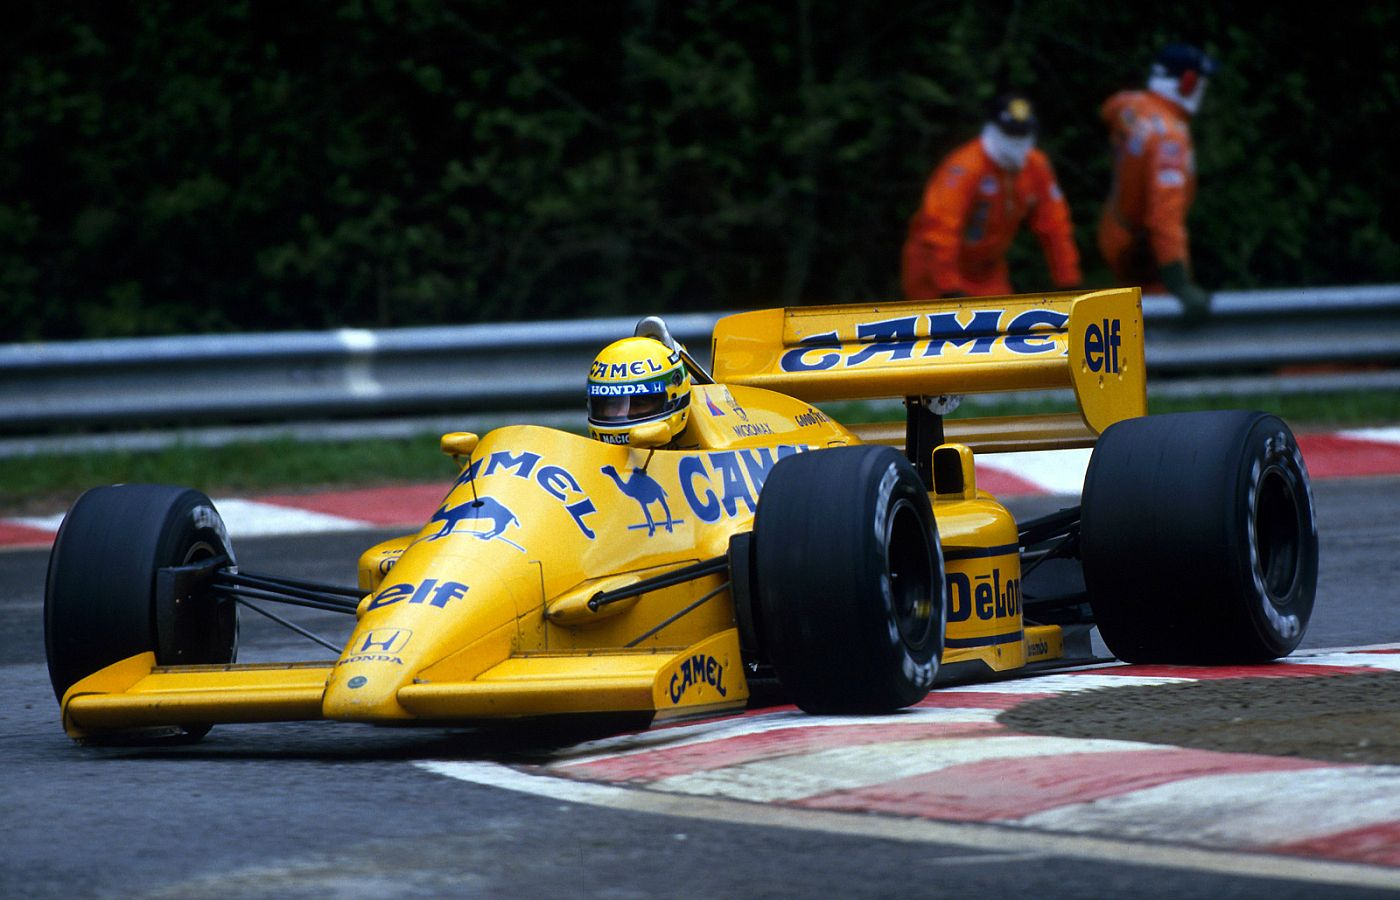 F1 History 1987 Lotus 99t Ayrton Senna And The Advent